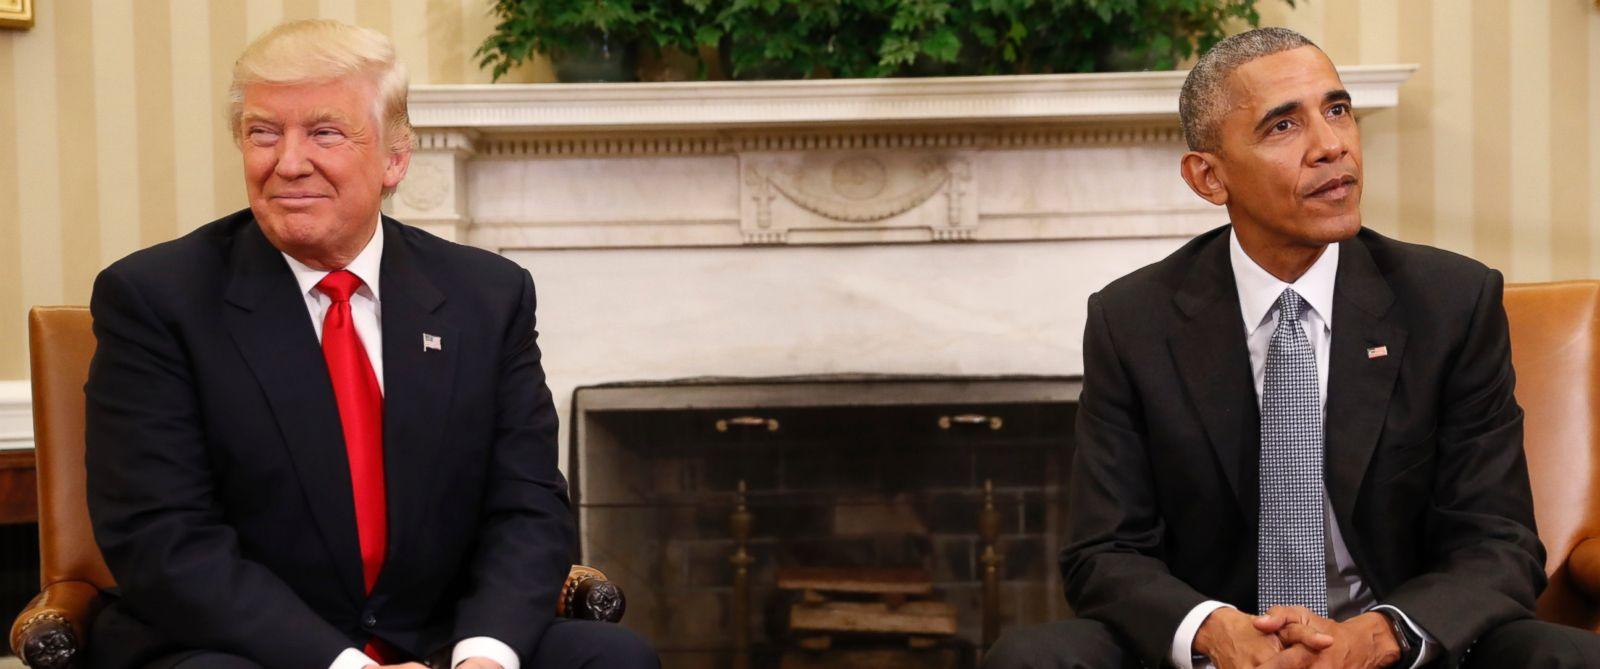 Trump: 'I Really Like President Obama'